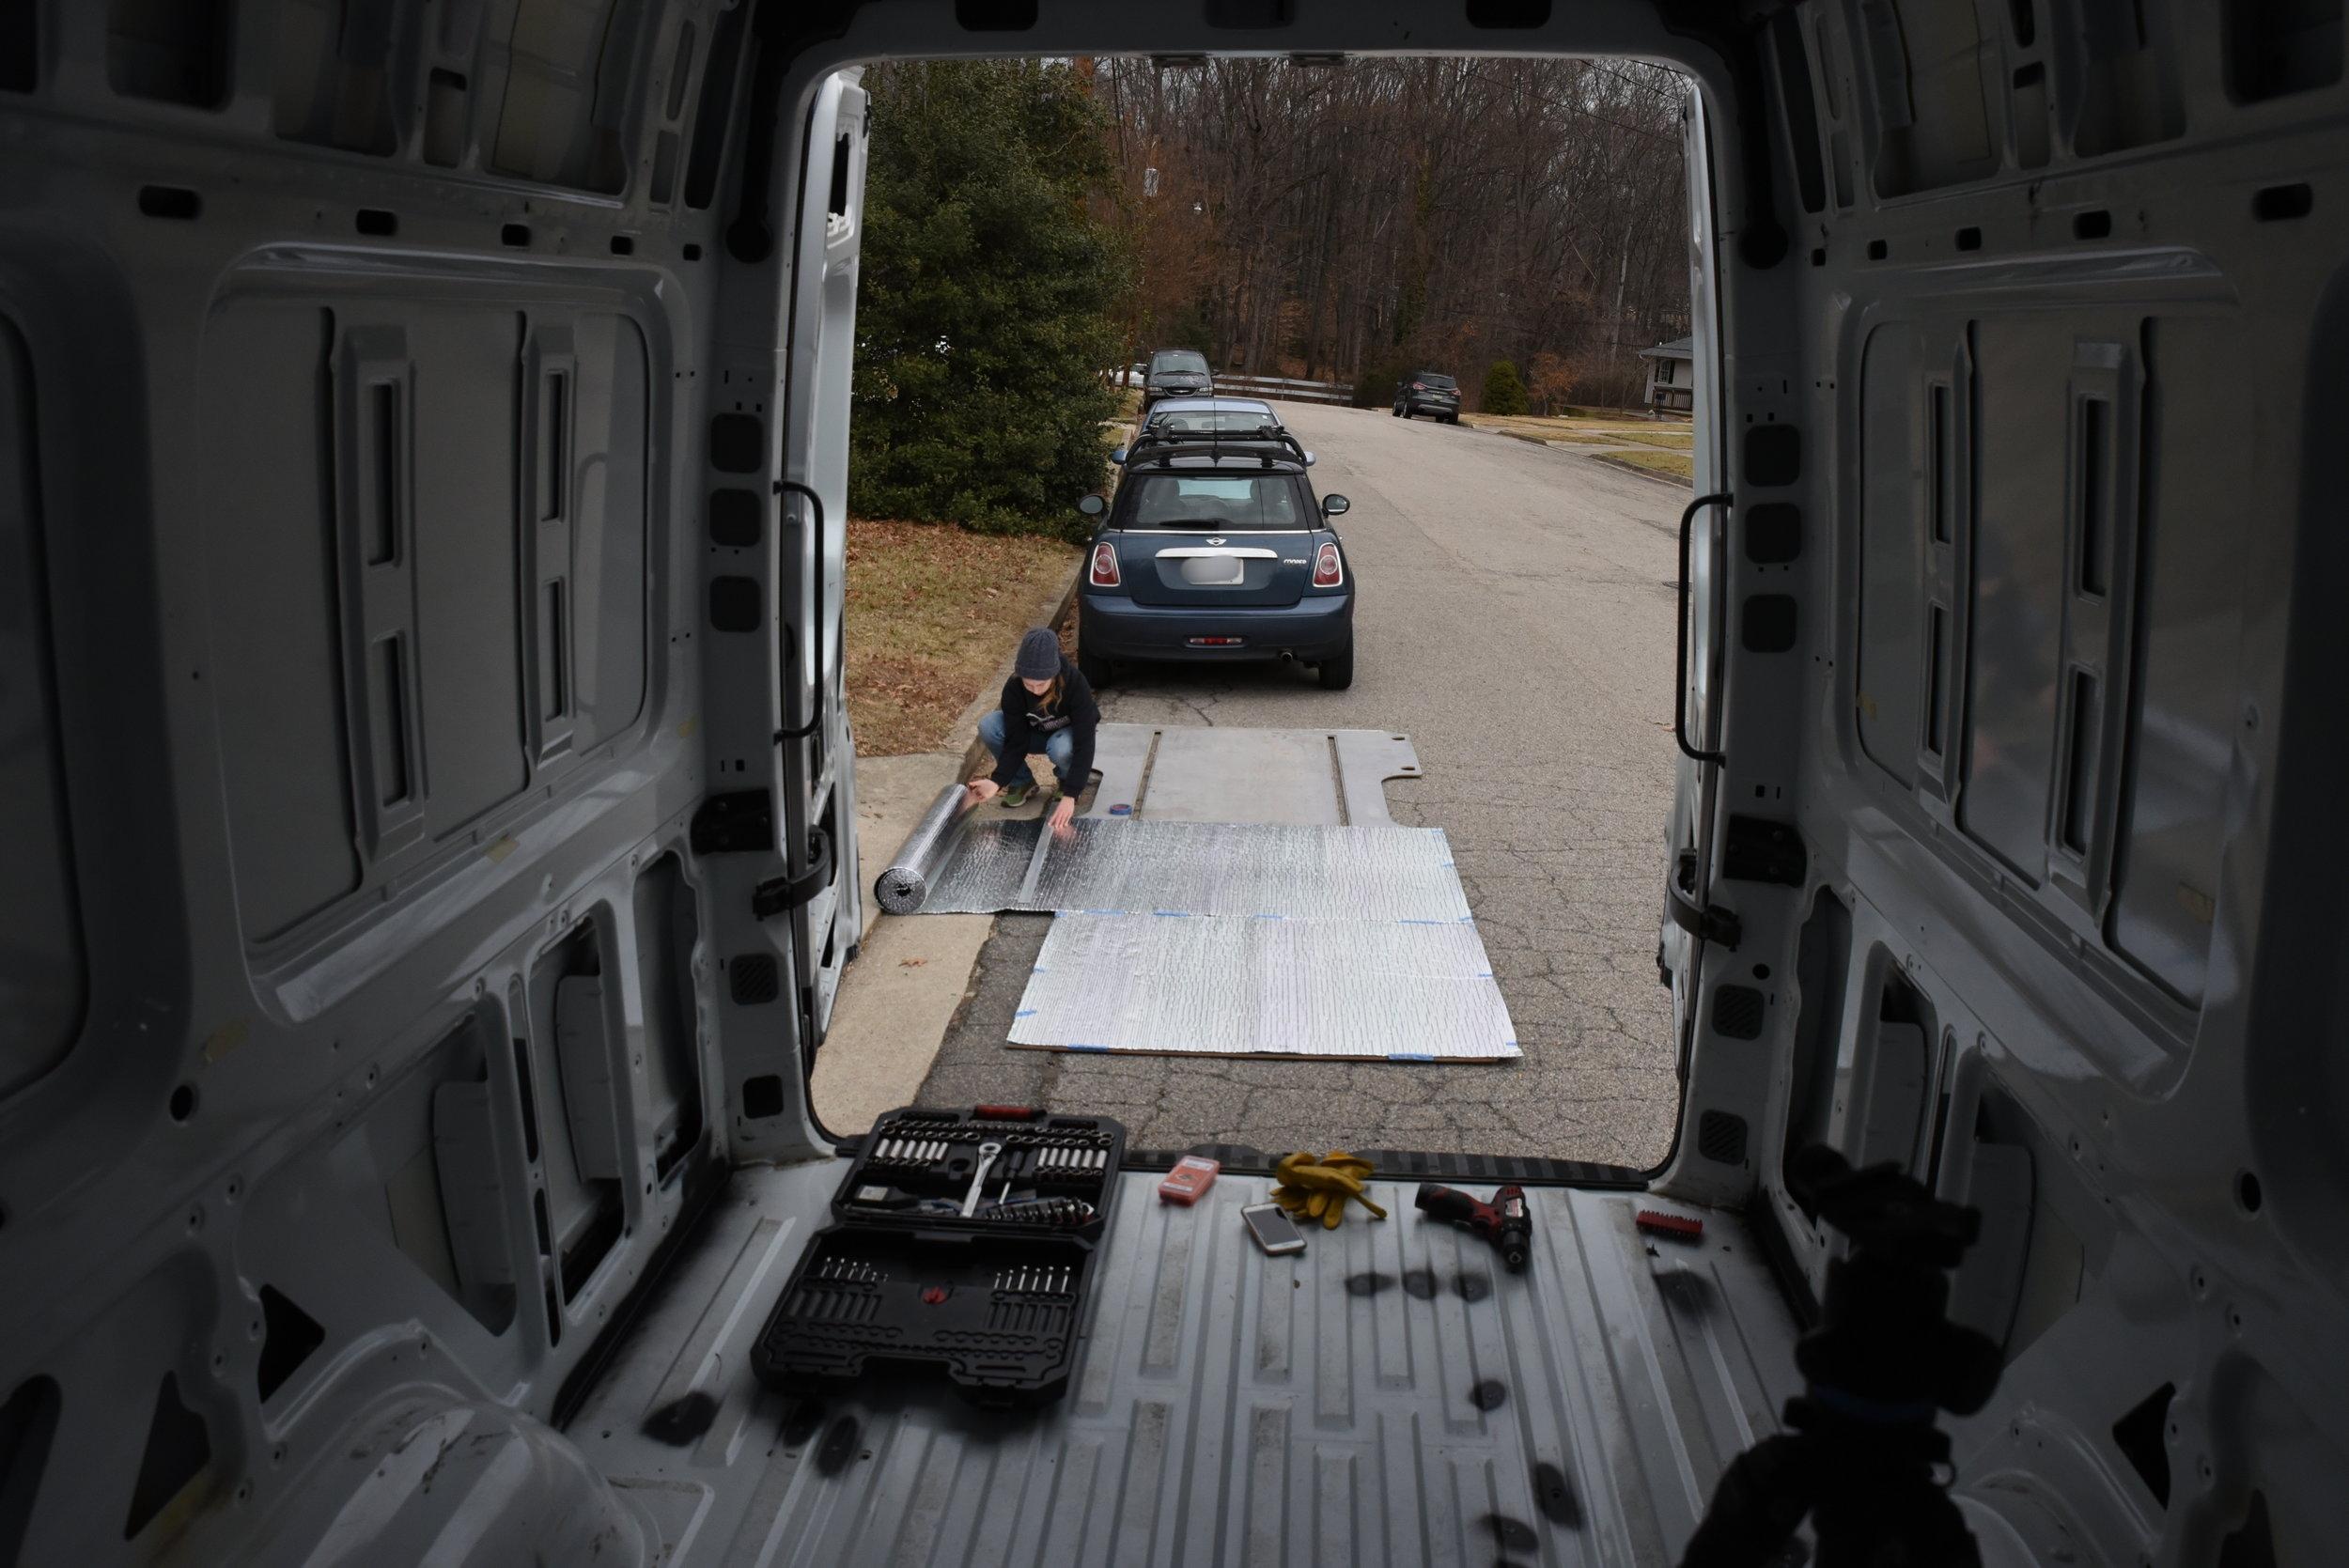 Kaylee measures the Reflectix using the van floor as a template.